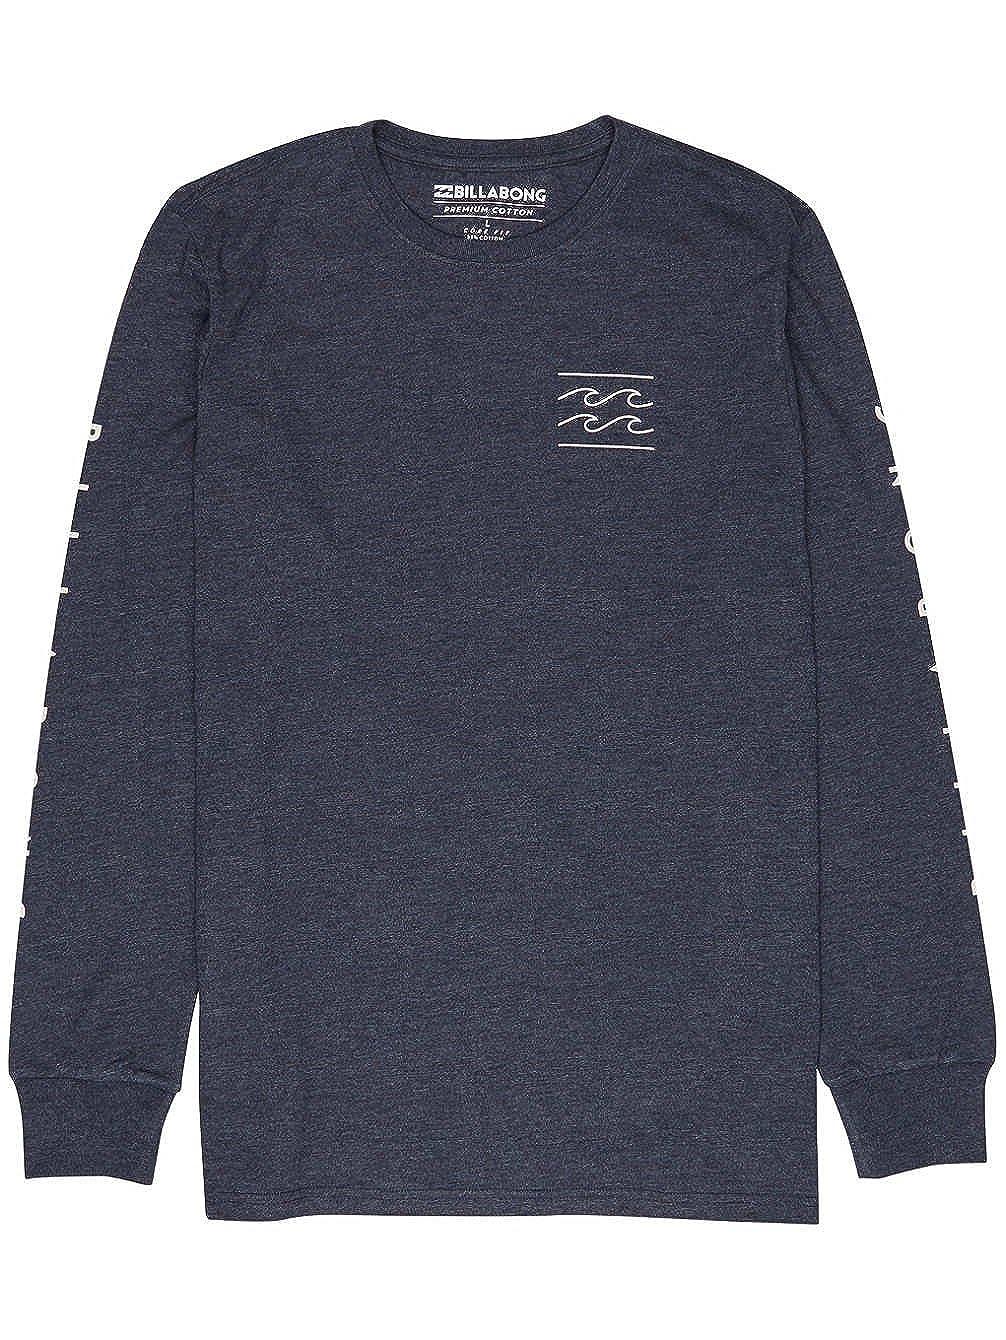 7da685a98fb89 Longsleeve Men Billabong Unity T-Shirt LS  Amazon.co.uk  Clothing